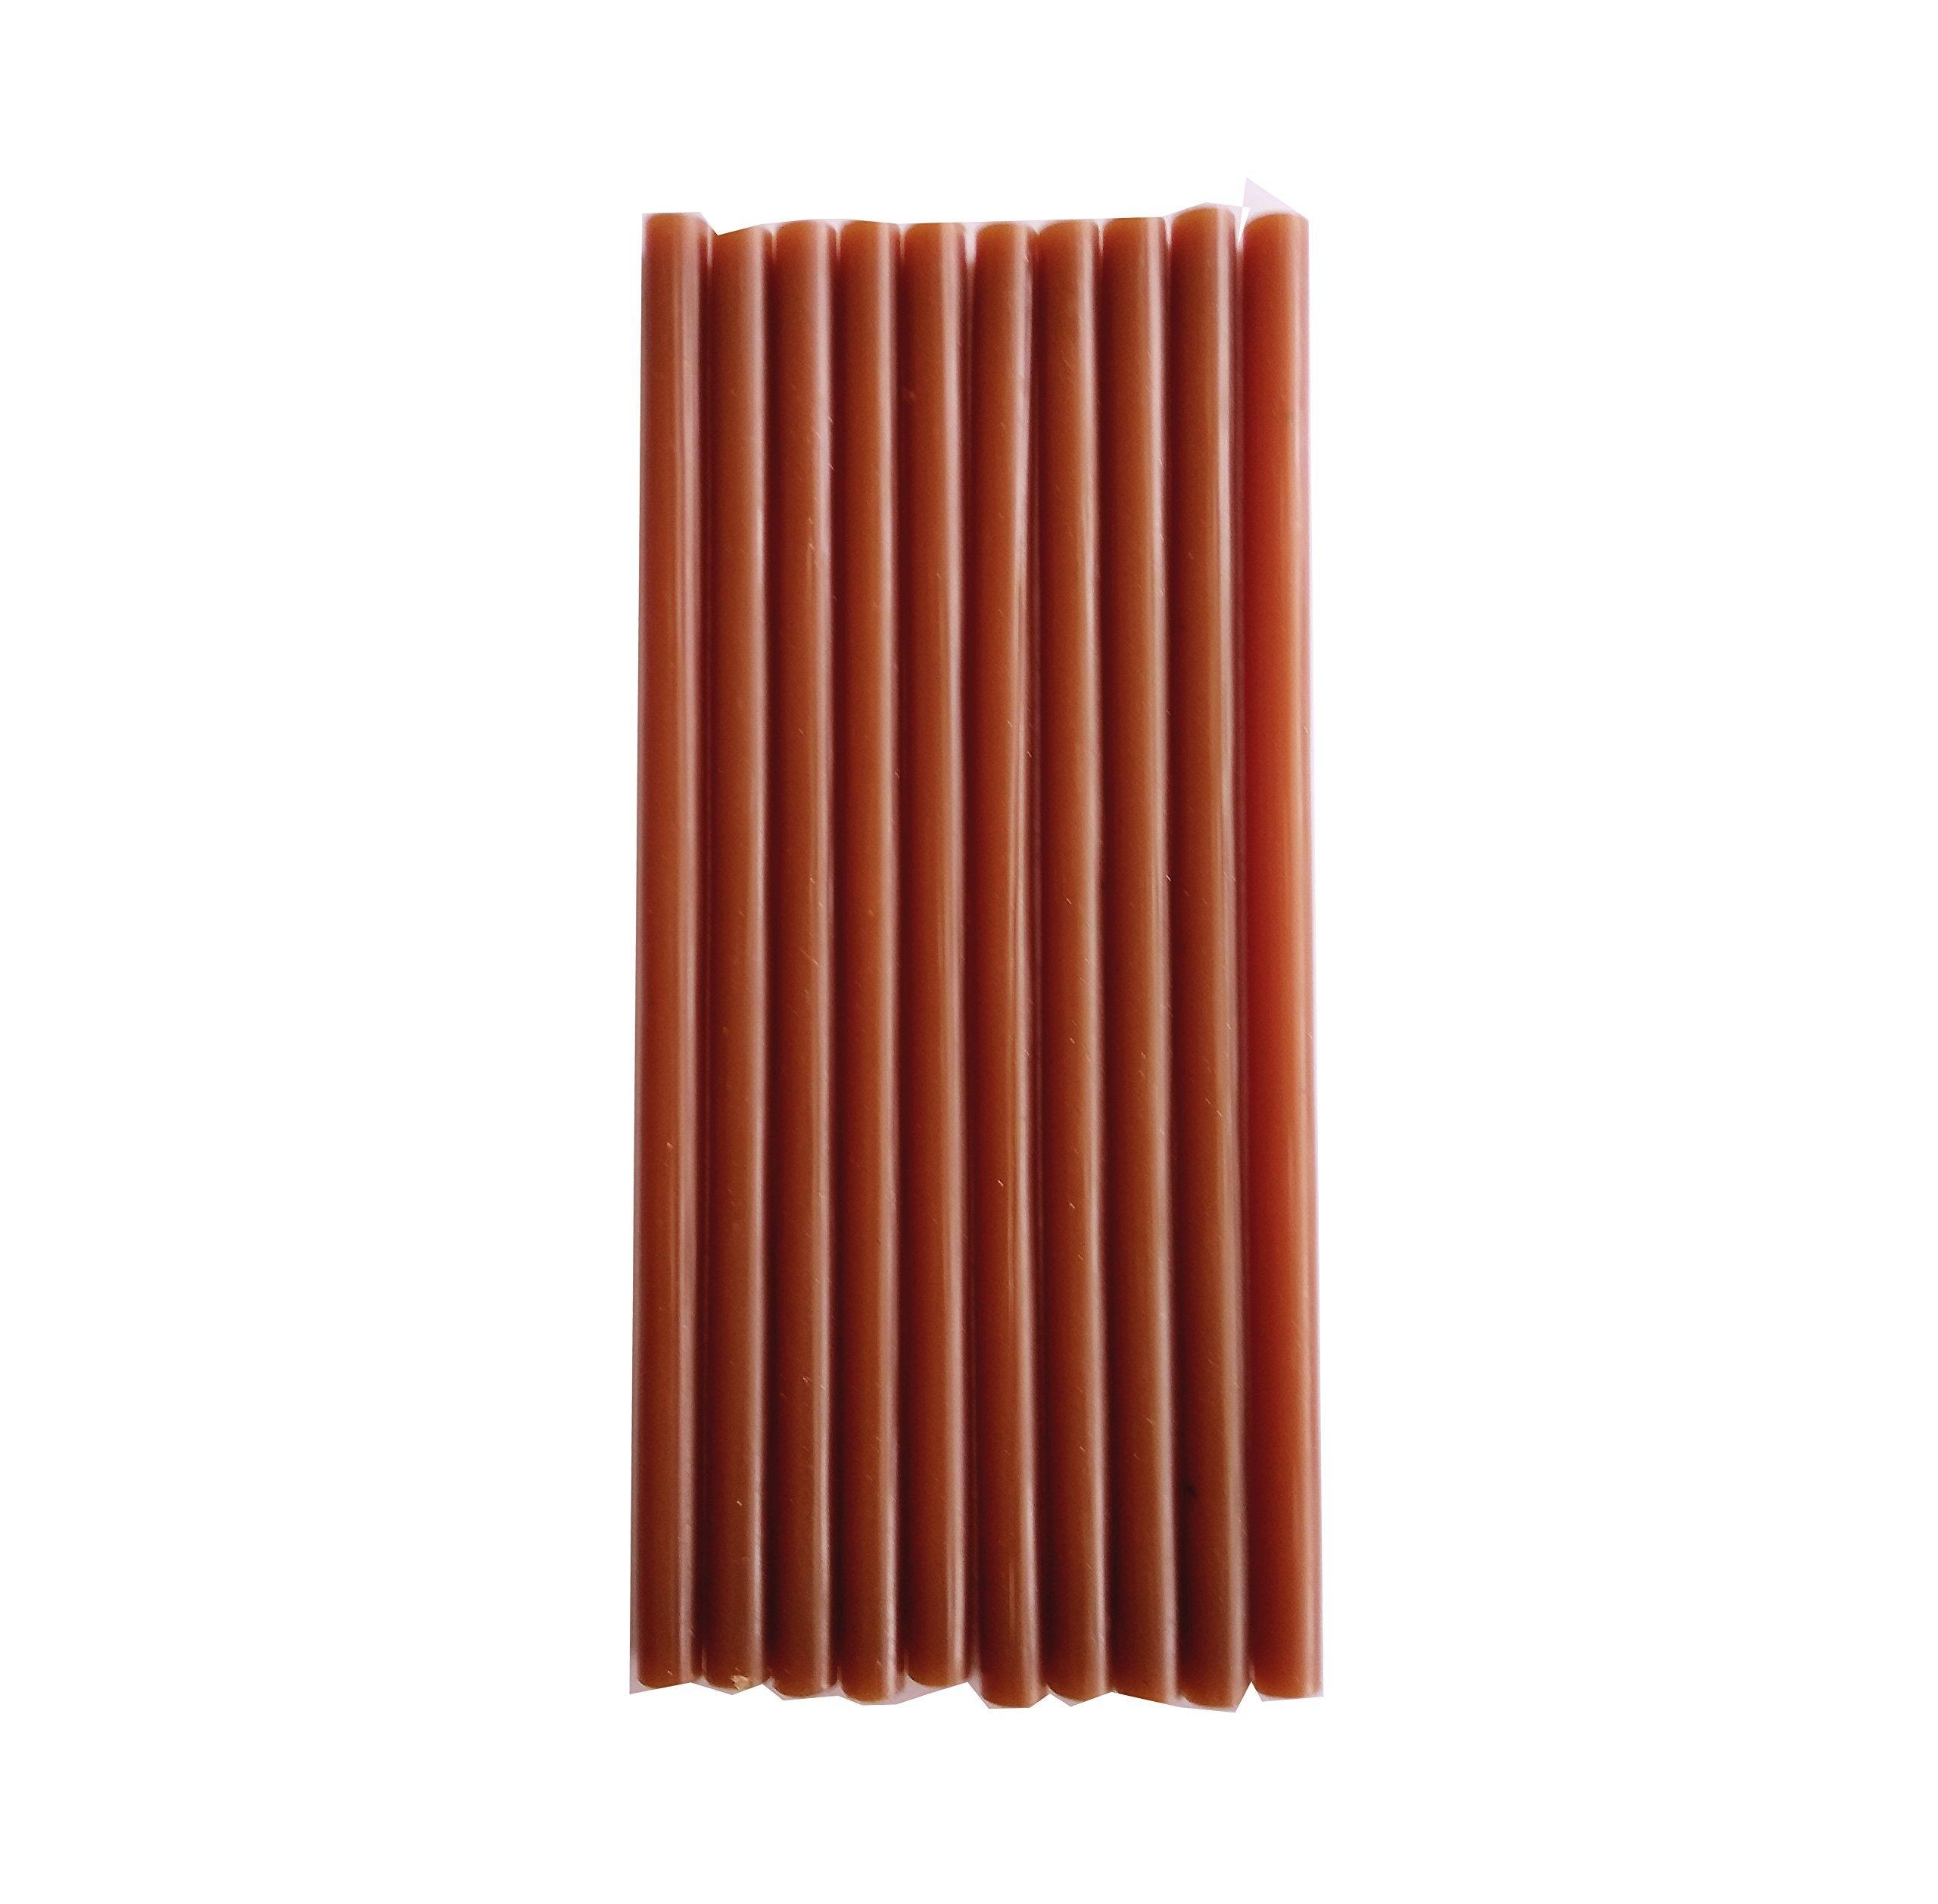 Heirloom Quality Industrial Strength Super Strong Glue Gun Sticks Dark Brown - Standard Pack of 10